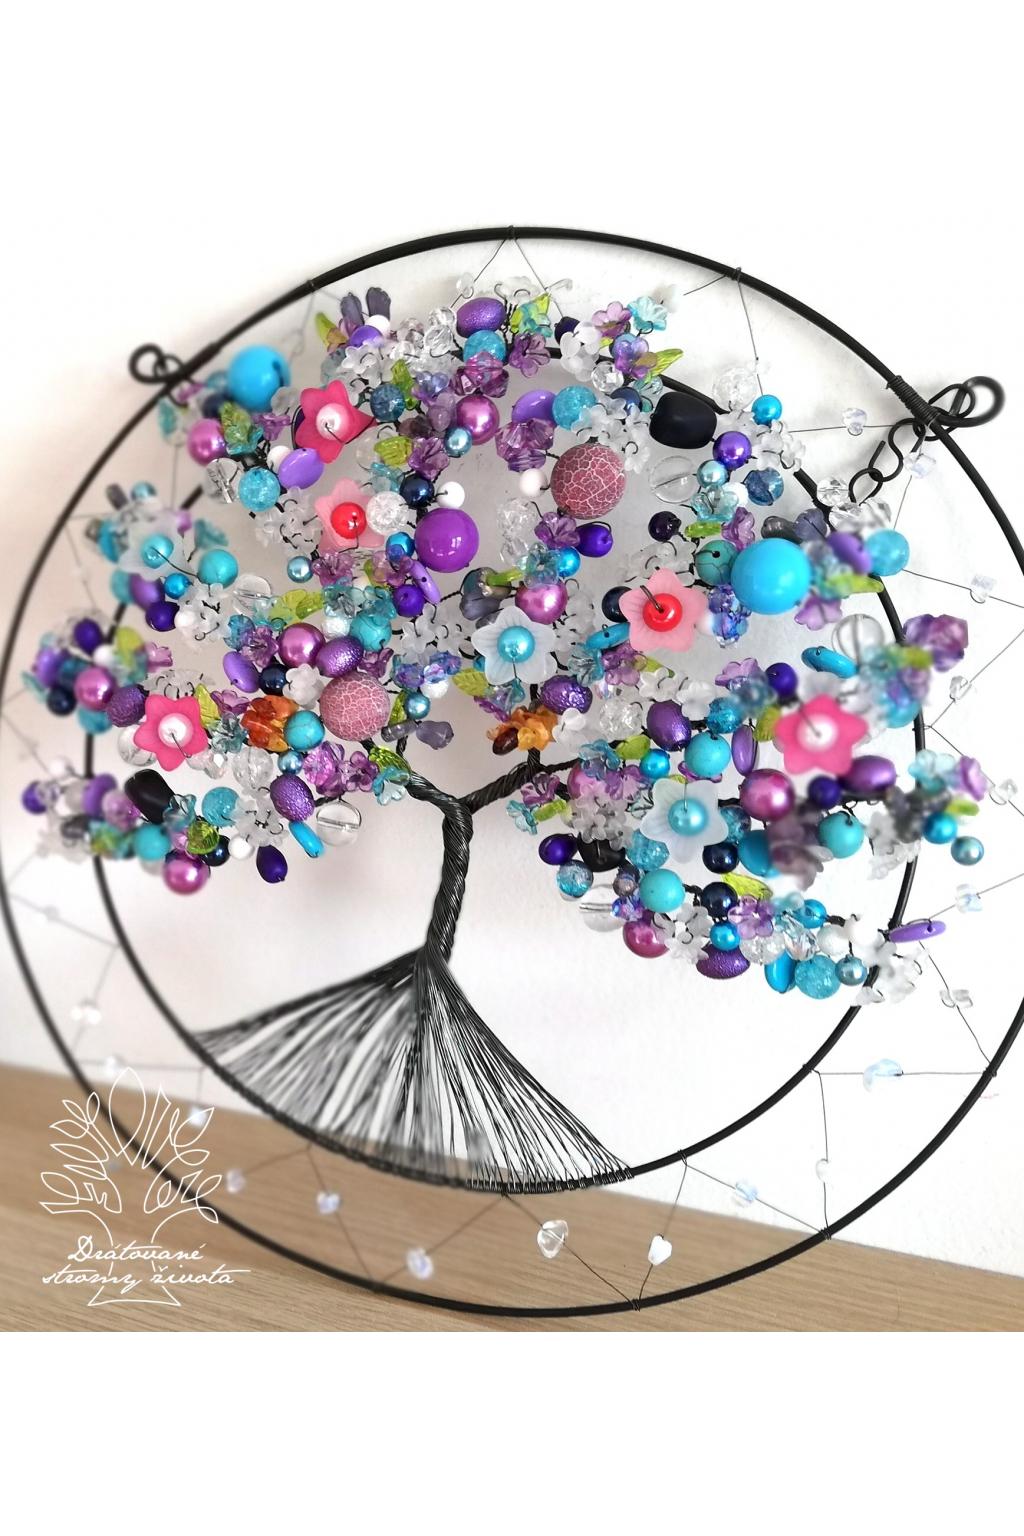 Drátovaný strom - Dotek duše 30cm